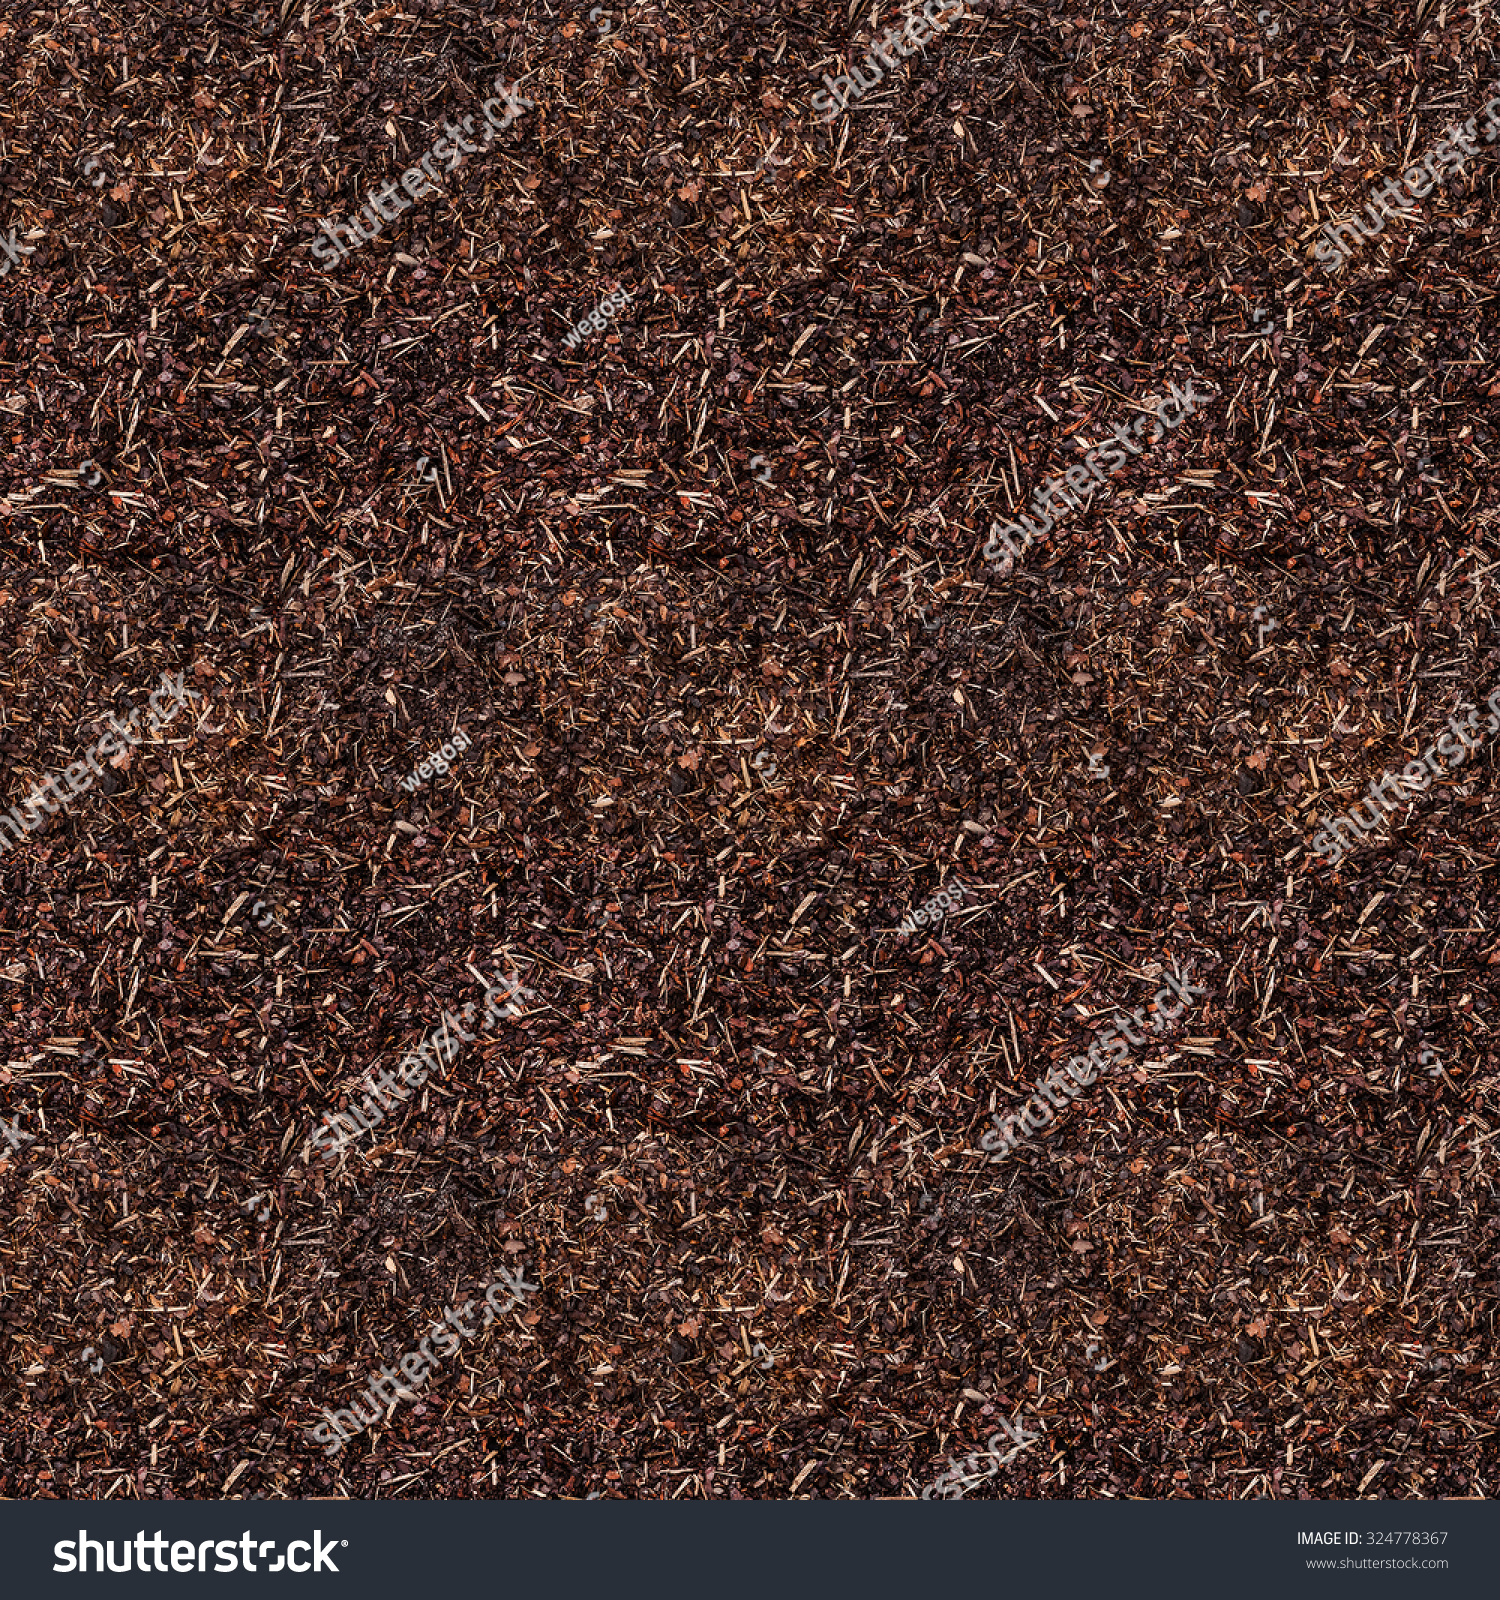 Wooden chip texture photo